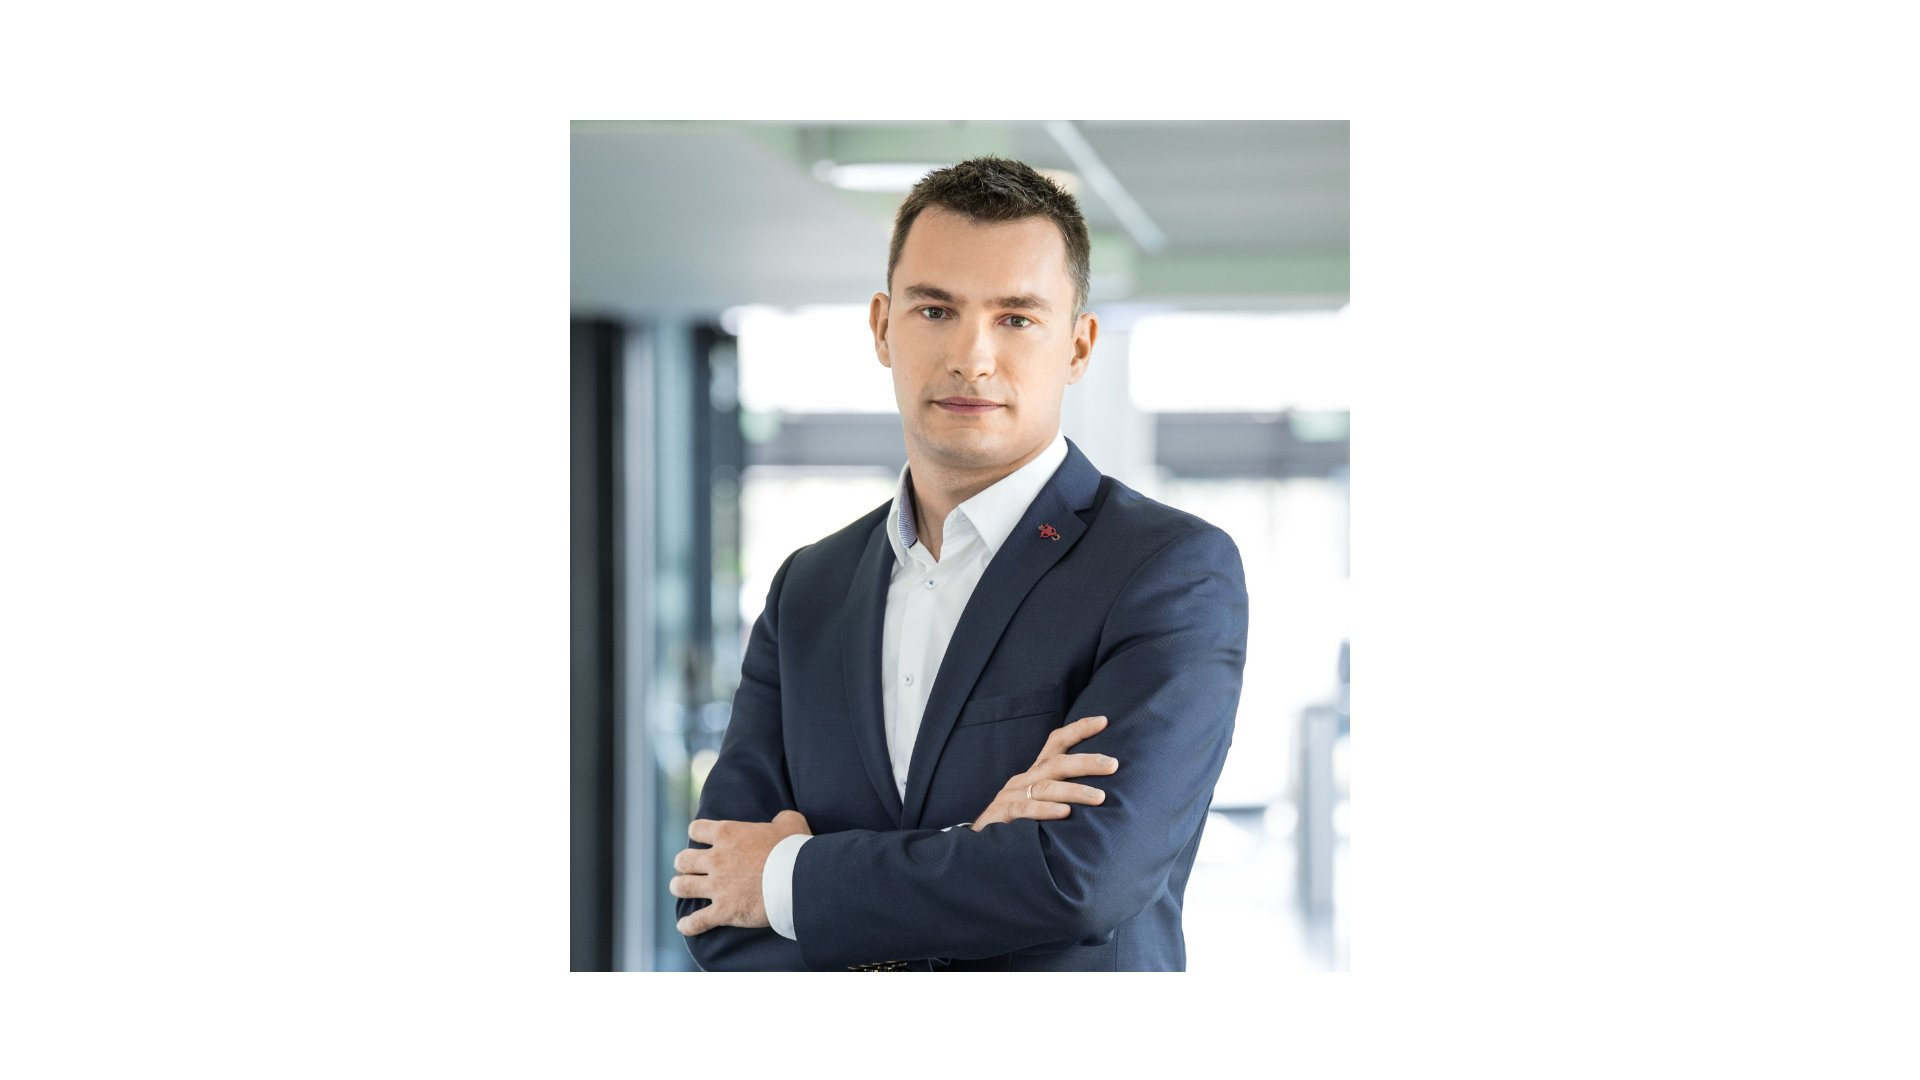 Nowy dyrektor w Accenture